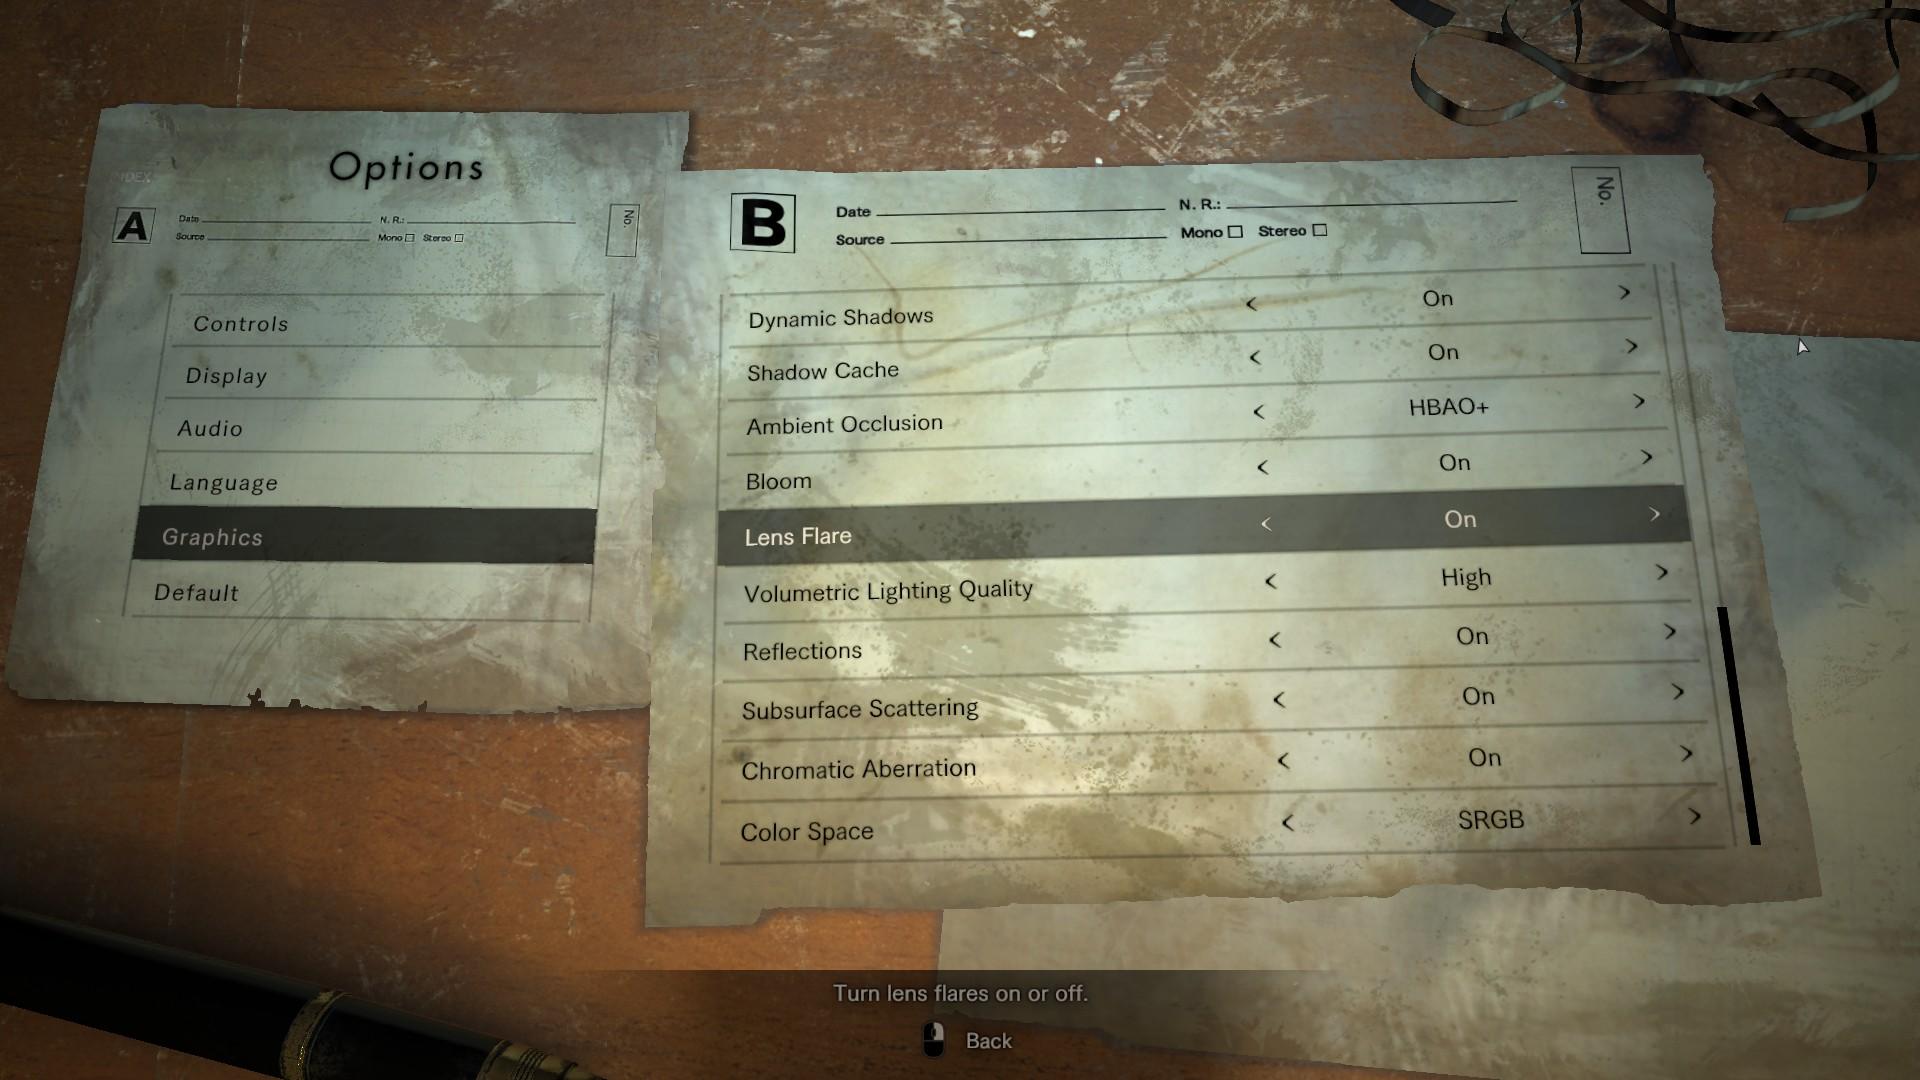 Resident Evil 7 - PC Performance Thread | NeoGAF